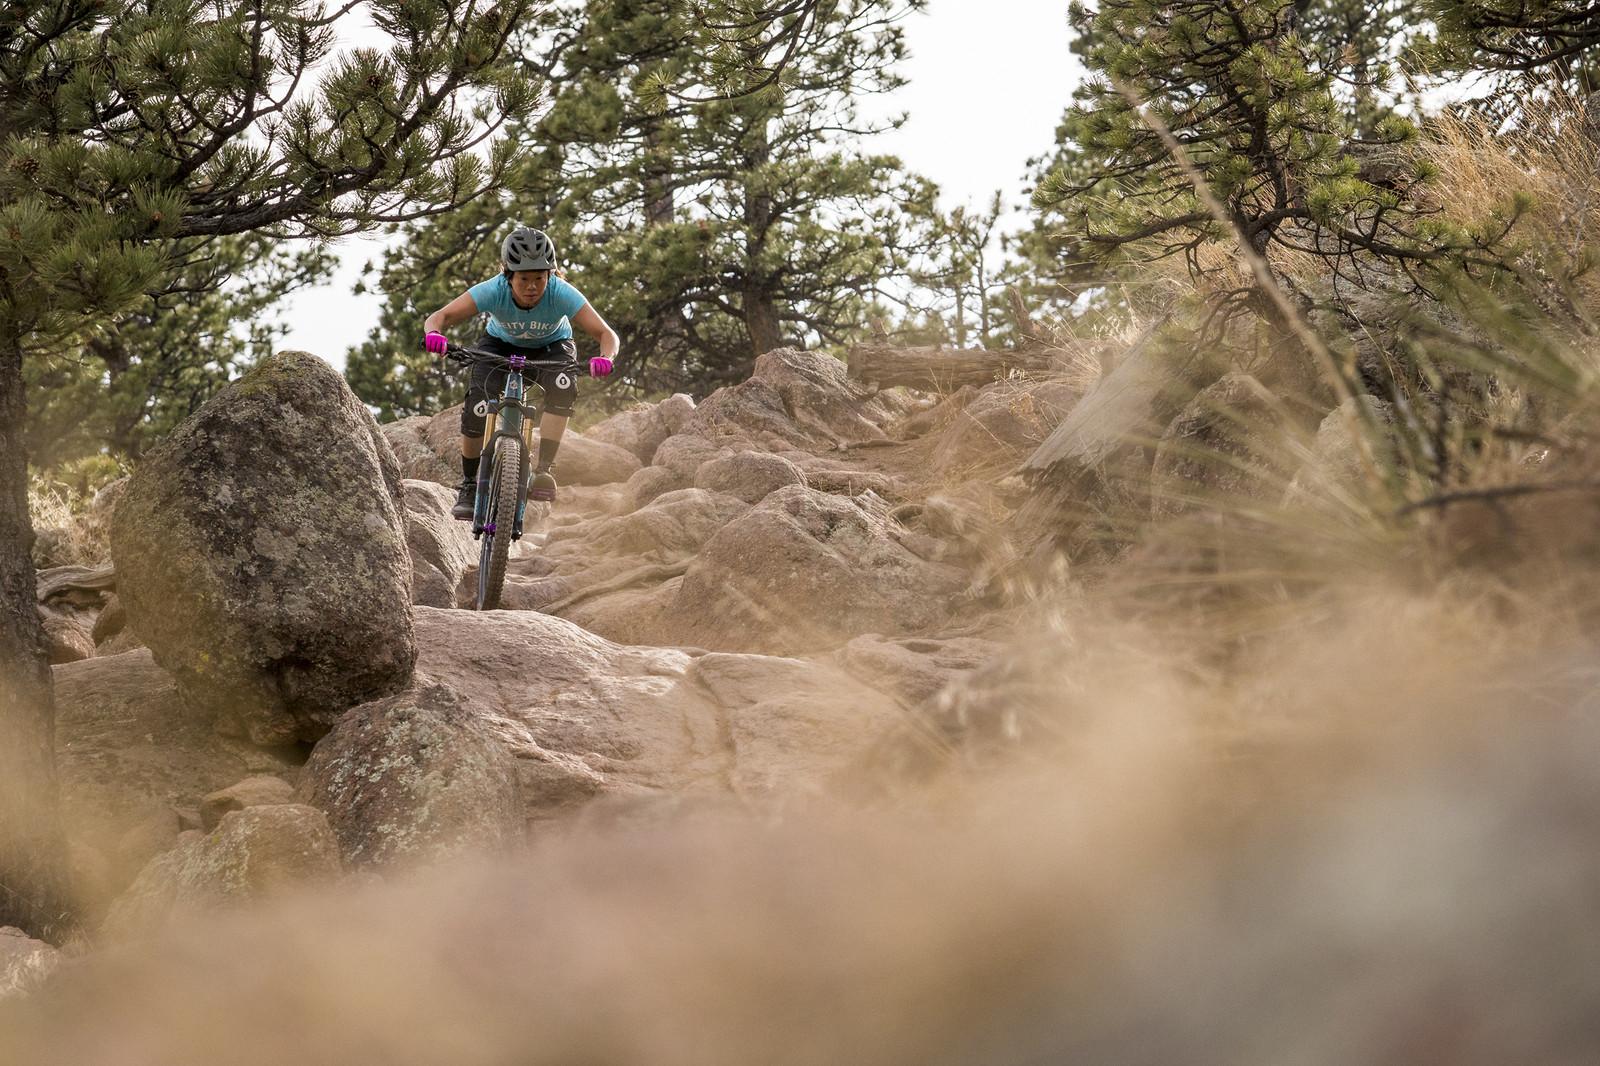 Rock Garden - gold_007 - Mountain Biking Pictures - Vital MTB